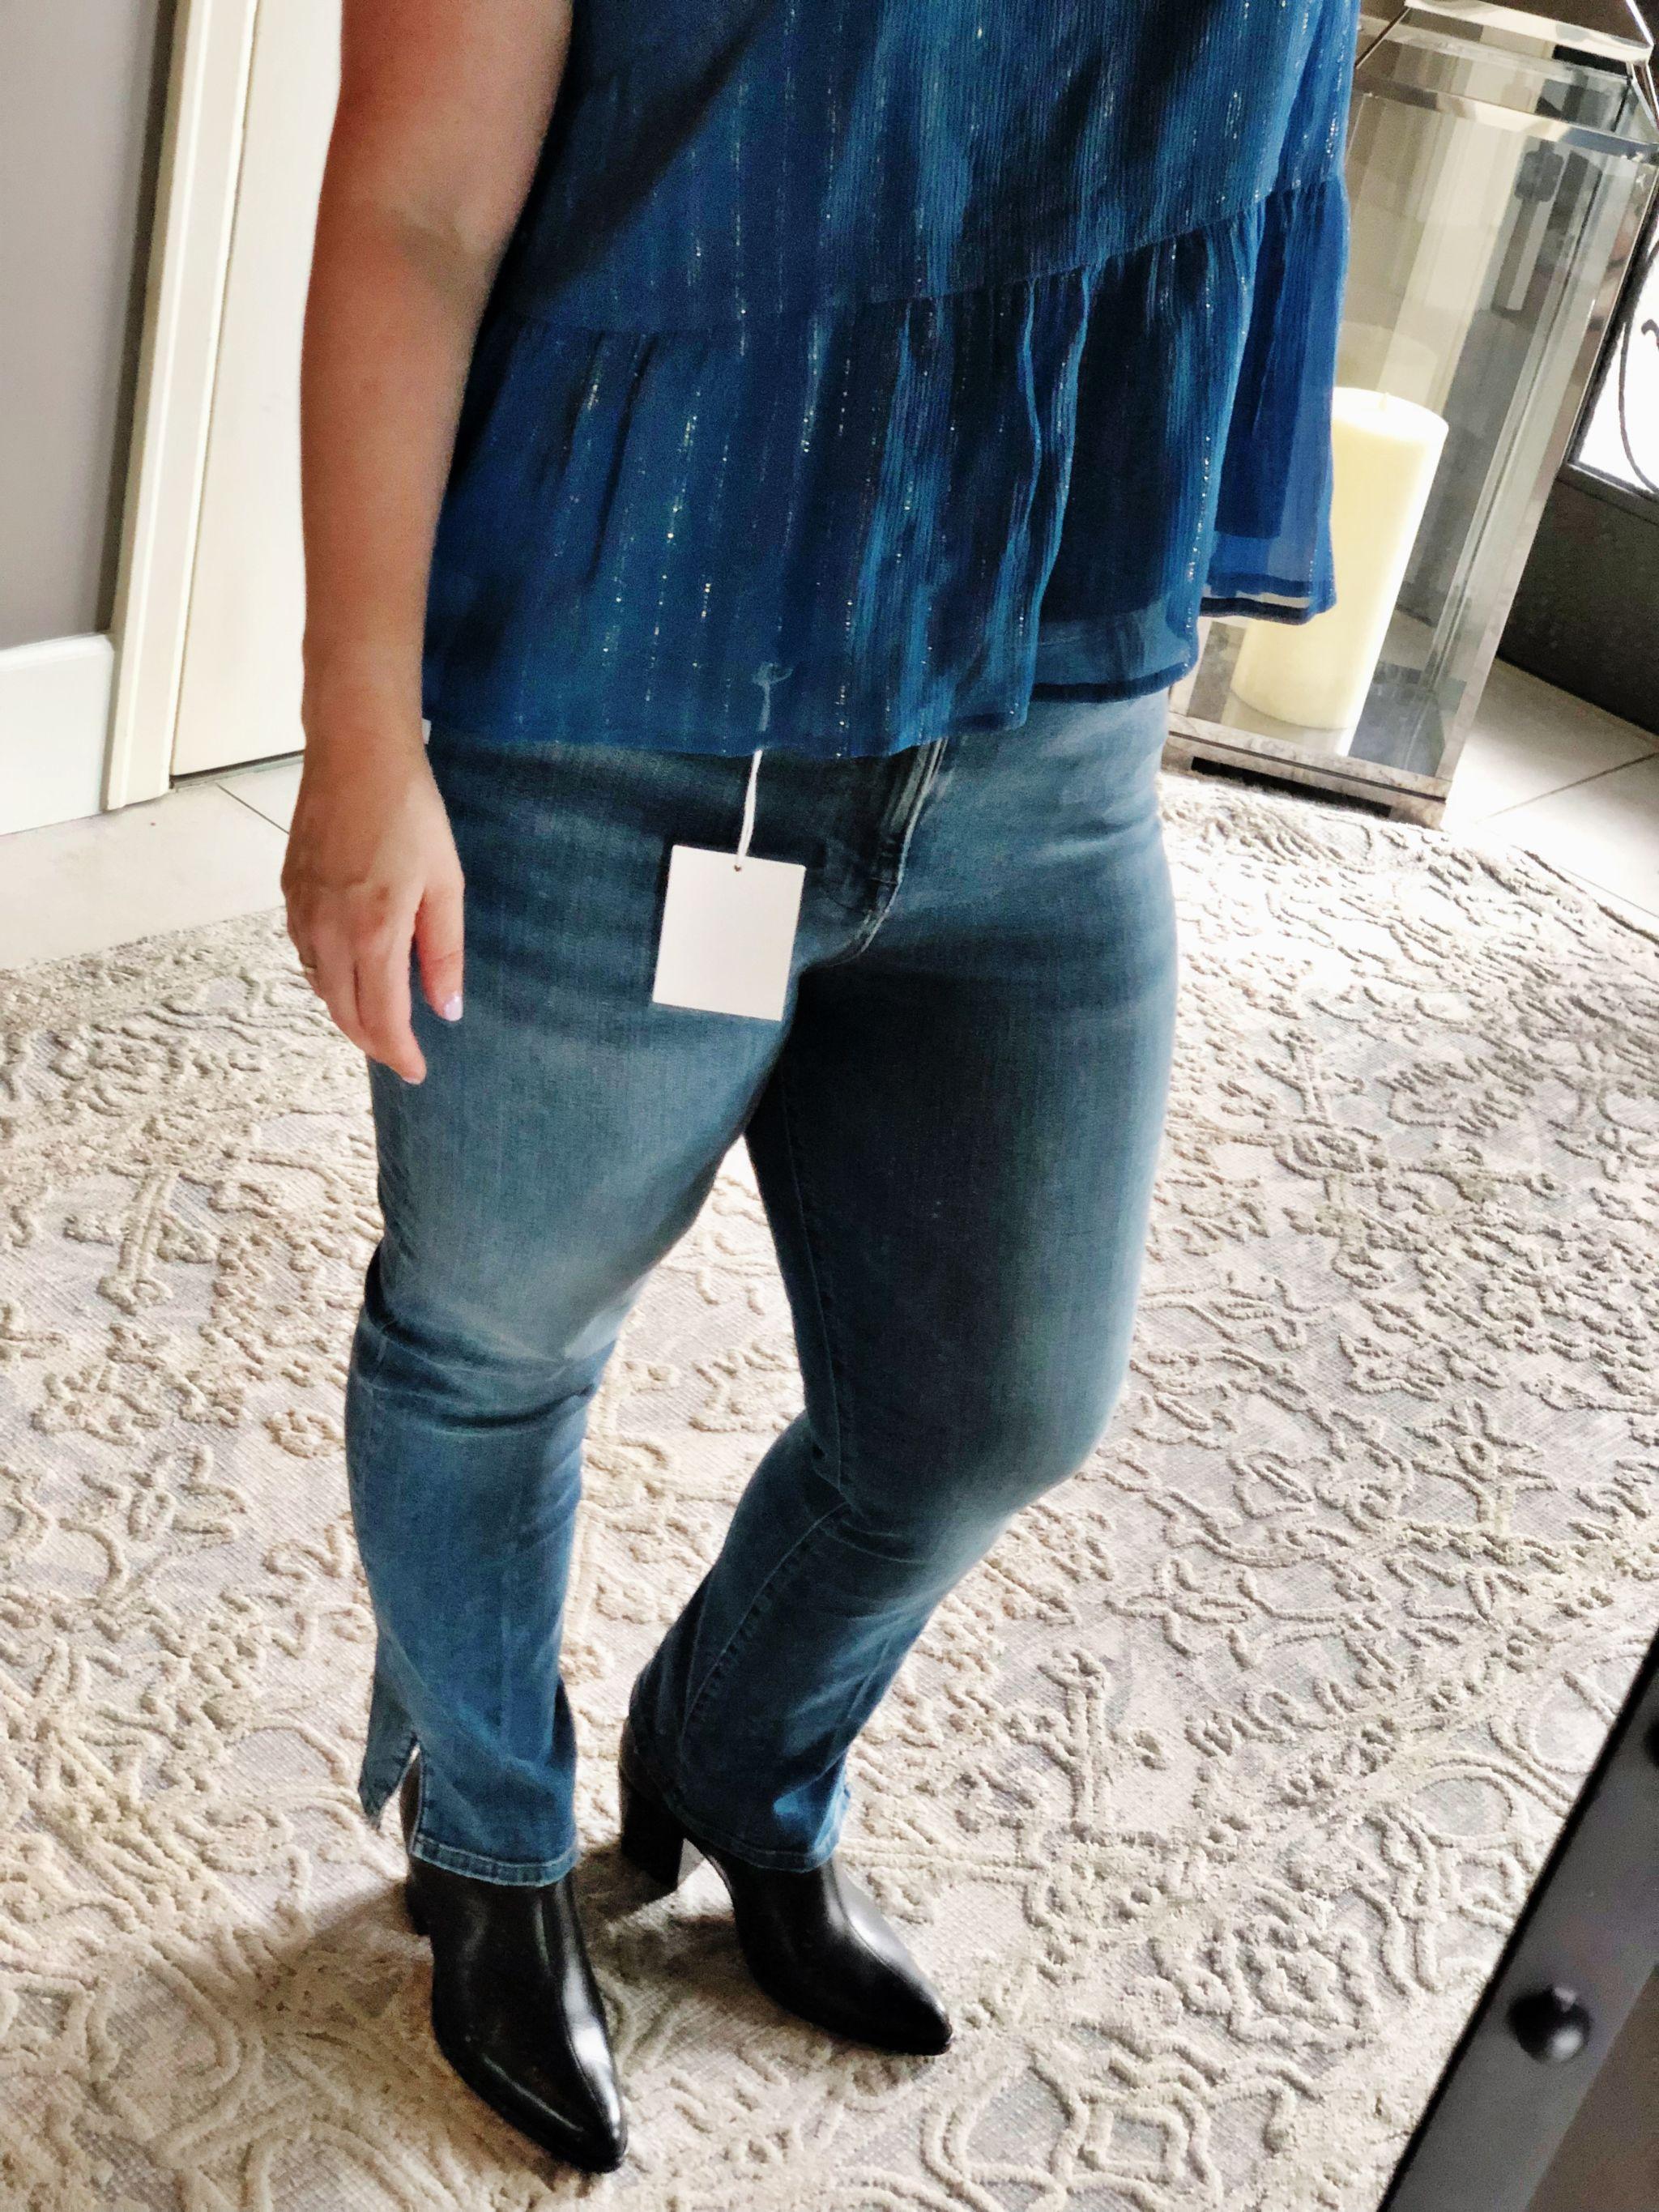 Lululemon Urban Strides Super High Rise Pant Activewear